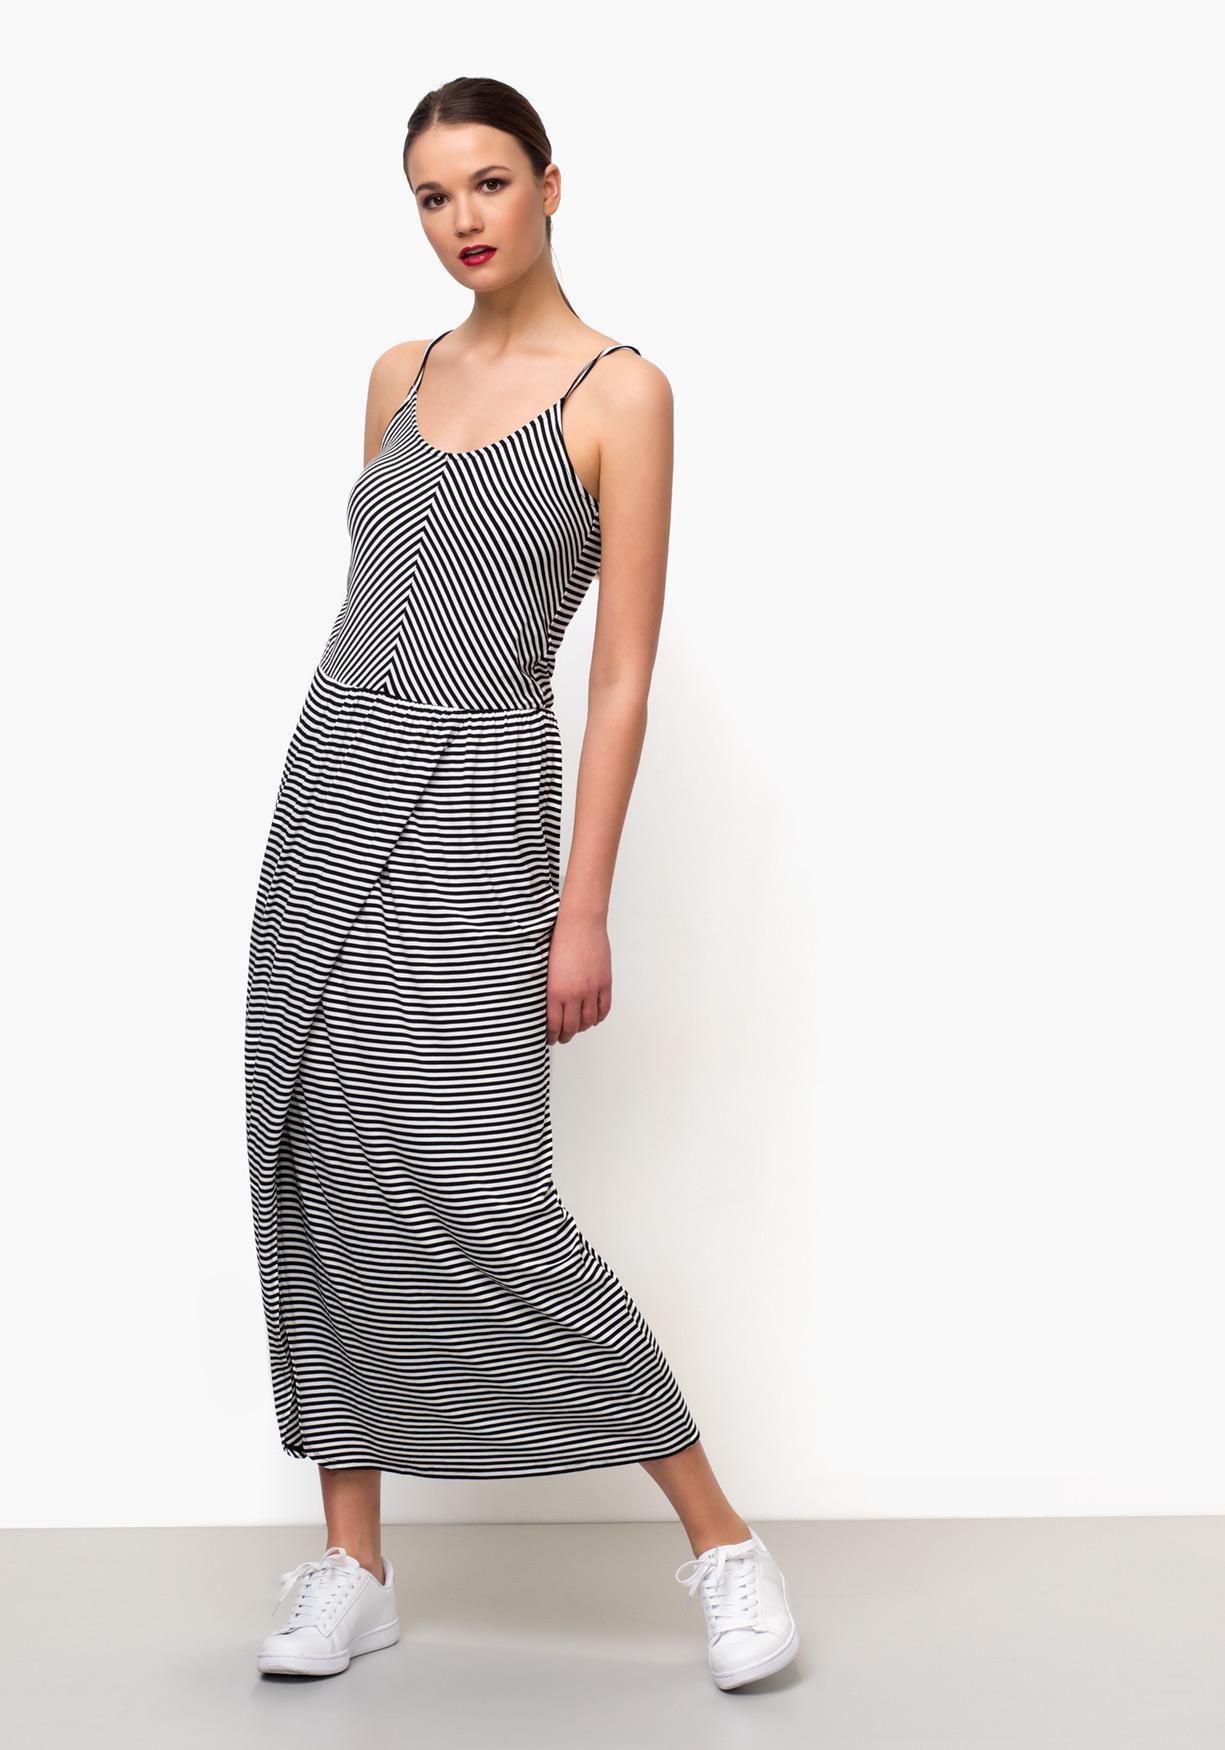 Comprar Vestido playa de mujer largo con tirantes TEX. ¡Aprovéchate ... 95e781d7fe16